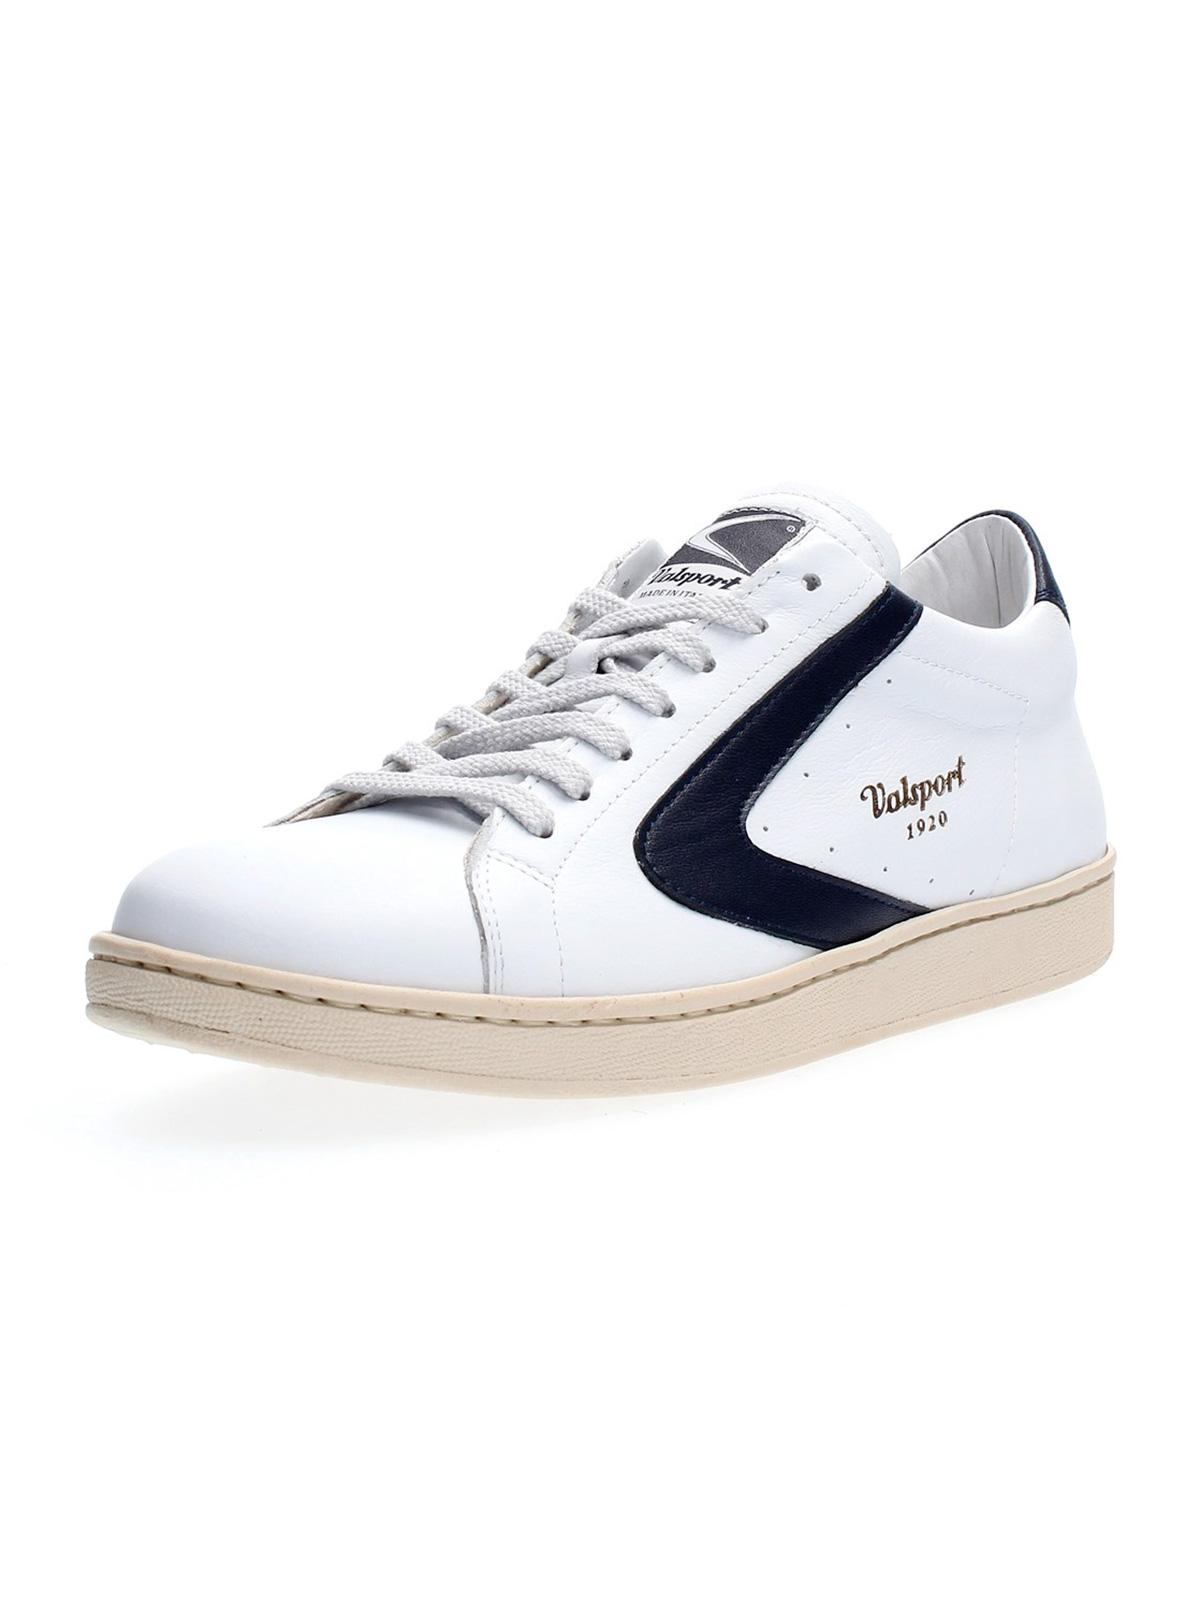 Picture of VALSPORT | Men's Tournament Crack Shoes